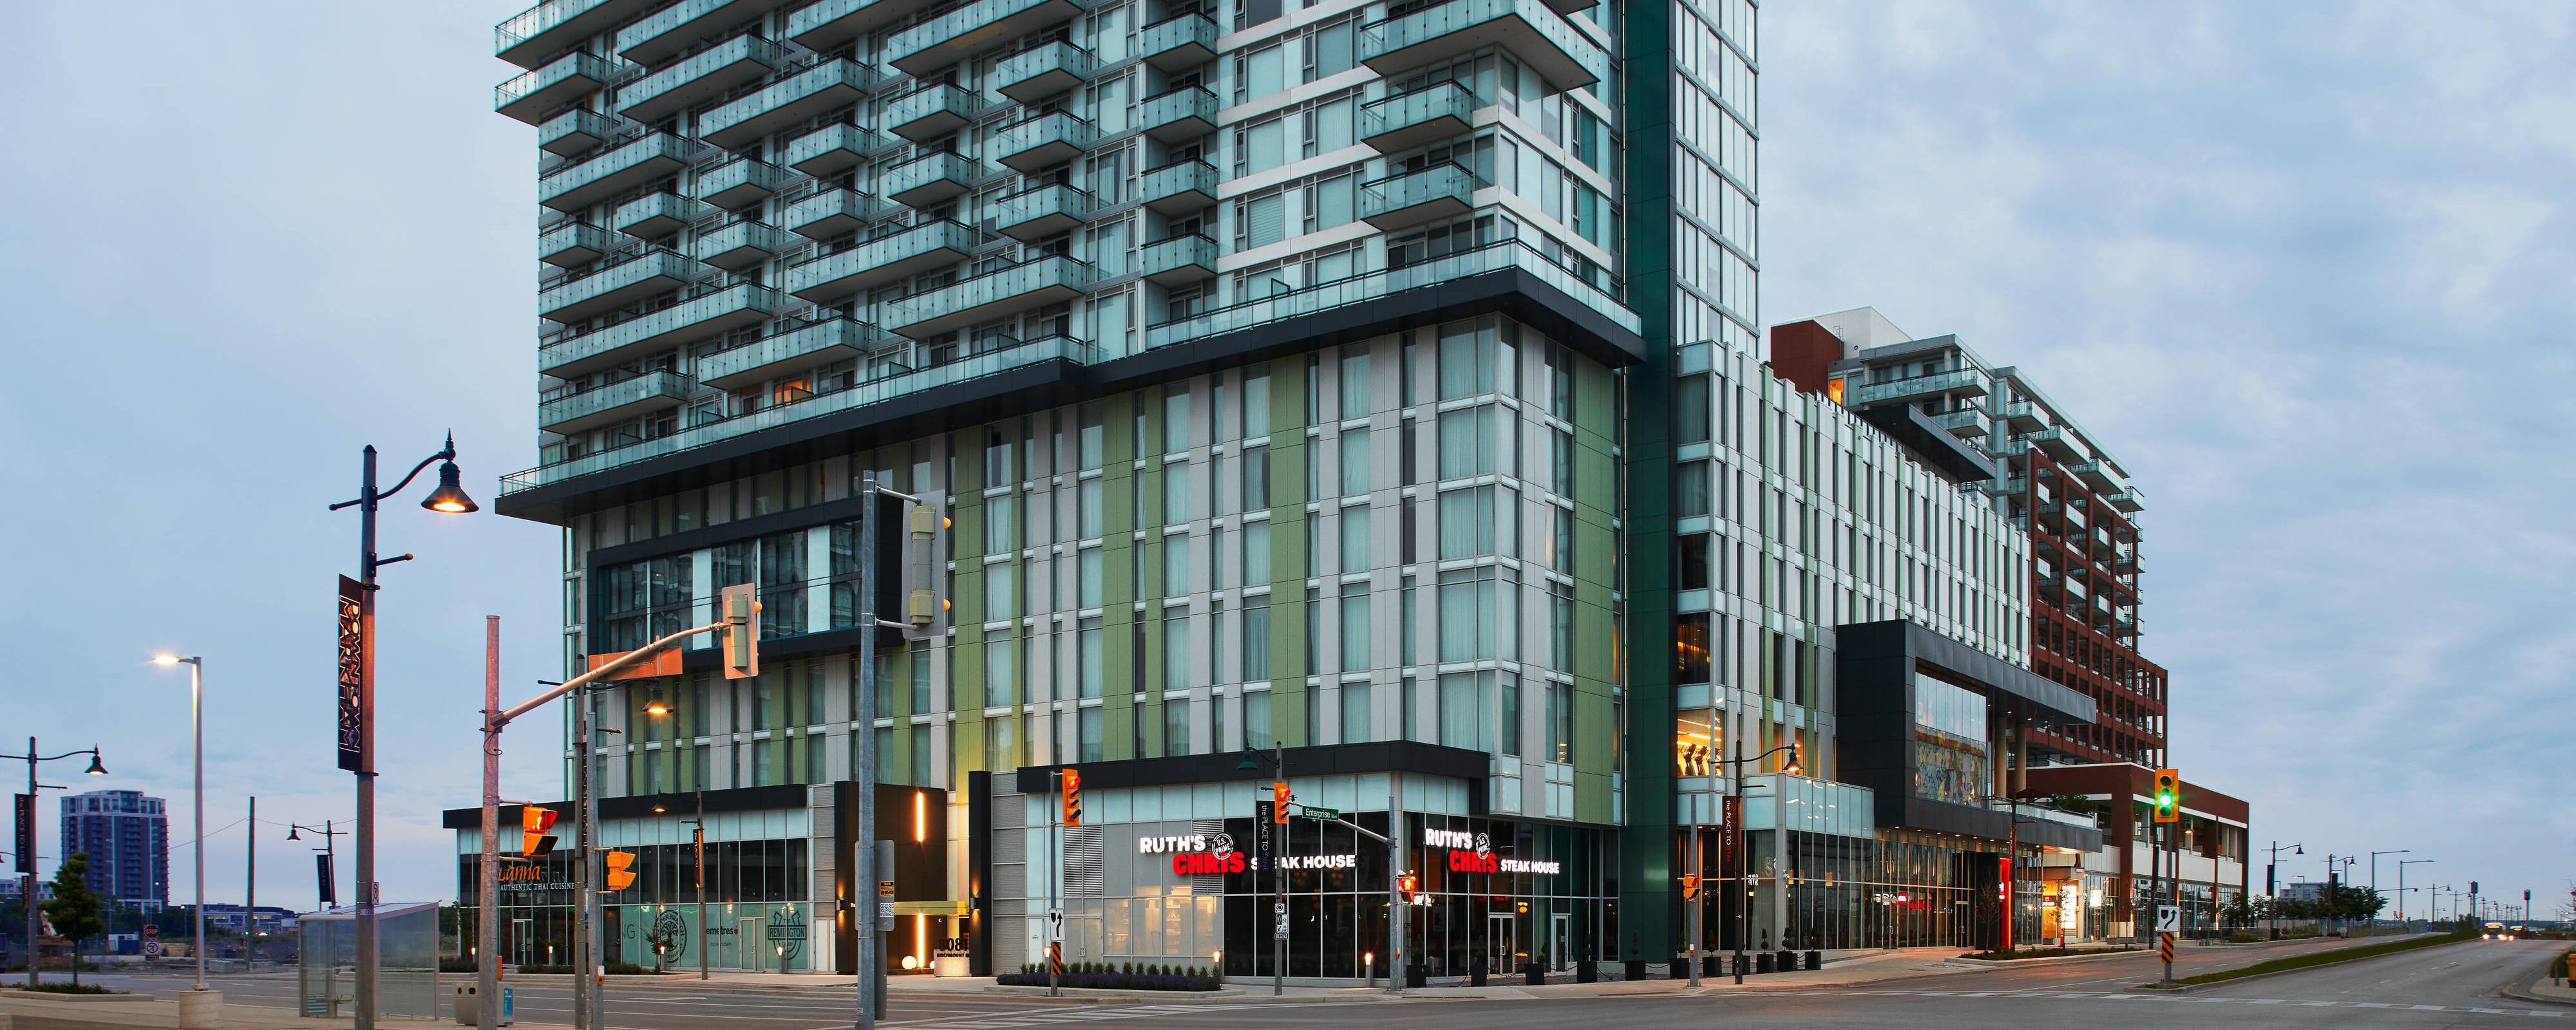 Hotel in Downtown Markham, Ontario   Toronto Marriott Markham